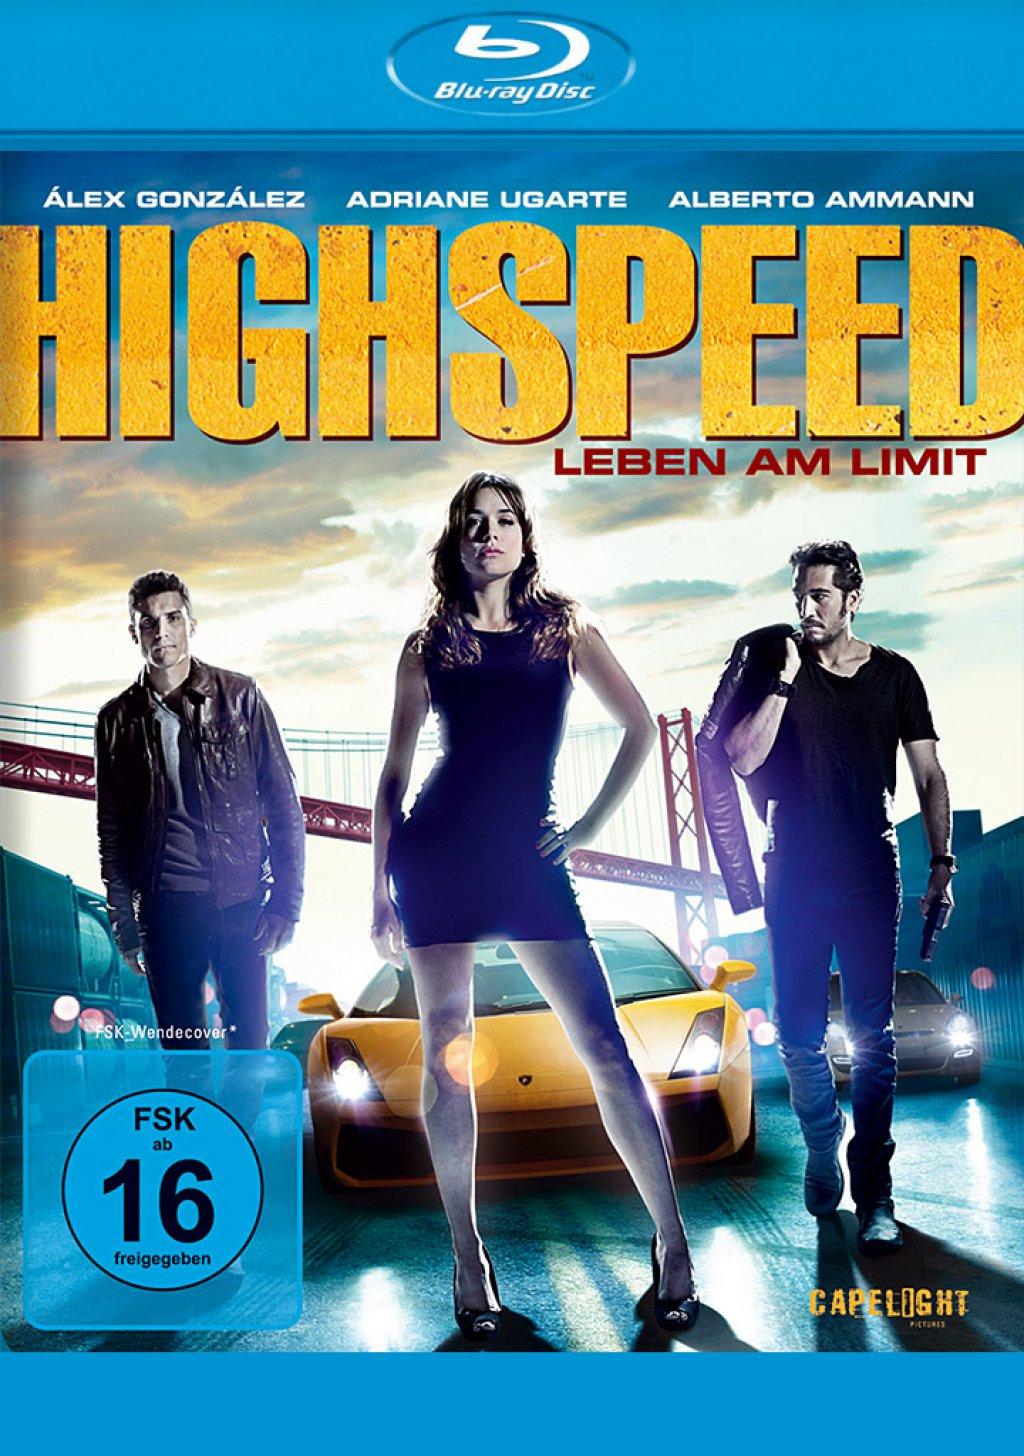 Highspeed - Leben am Limit (Blu-ray)